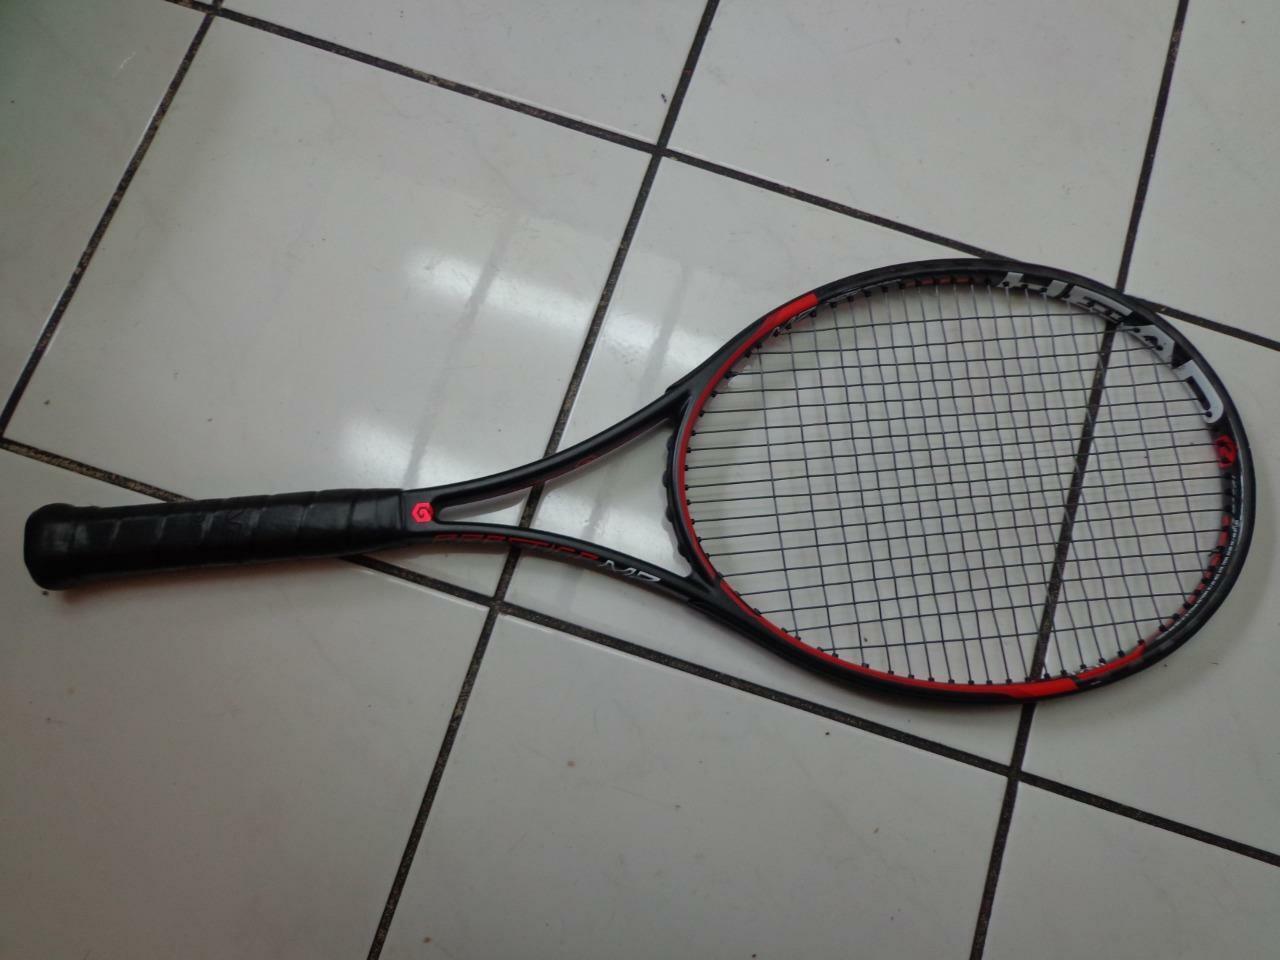 Head Graphene Xt Prestige MP 98 Head 18x20 4 1 4 grip raquette de tennis